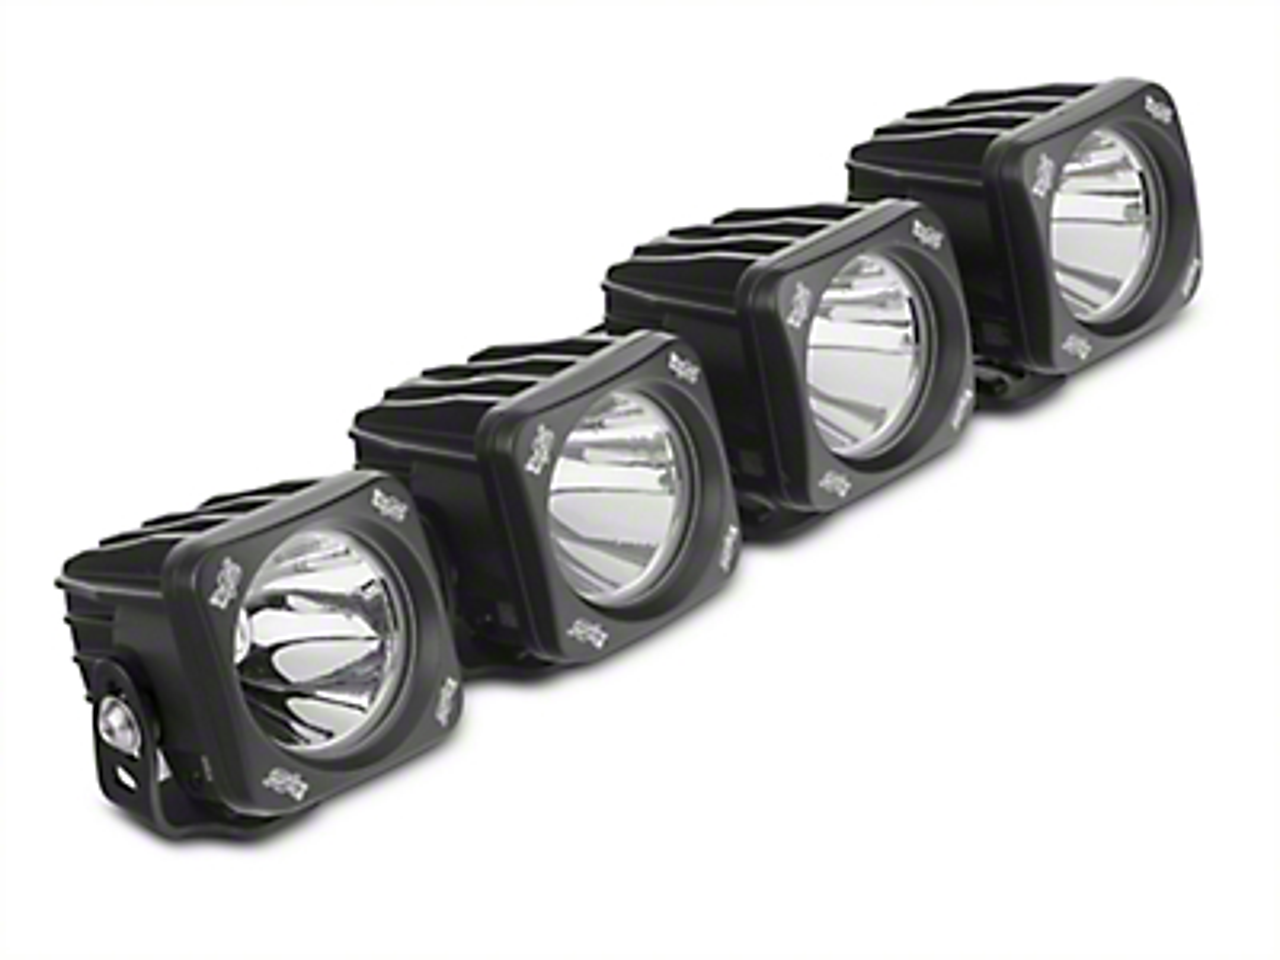 Vision X 3 in. Optimus LED Cube Fog Lights w/ Mounting Brackets (17-18 Raptor)